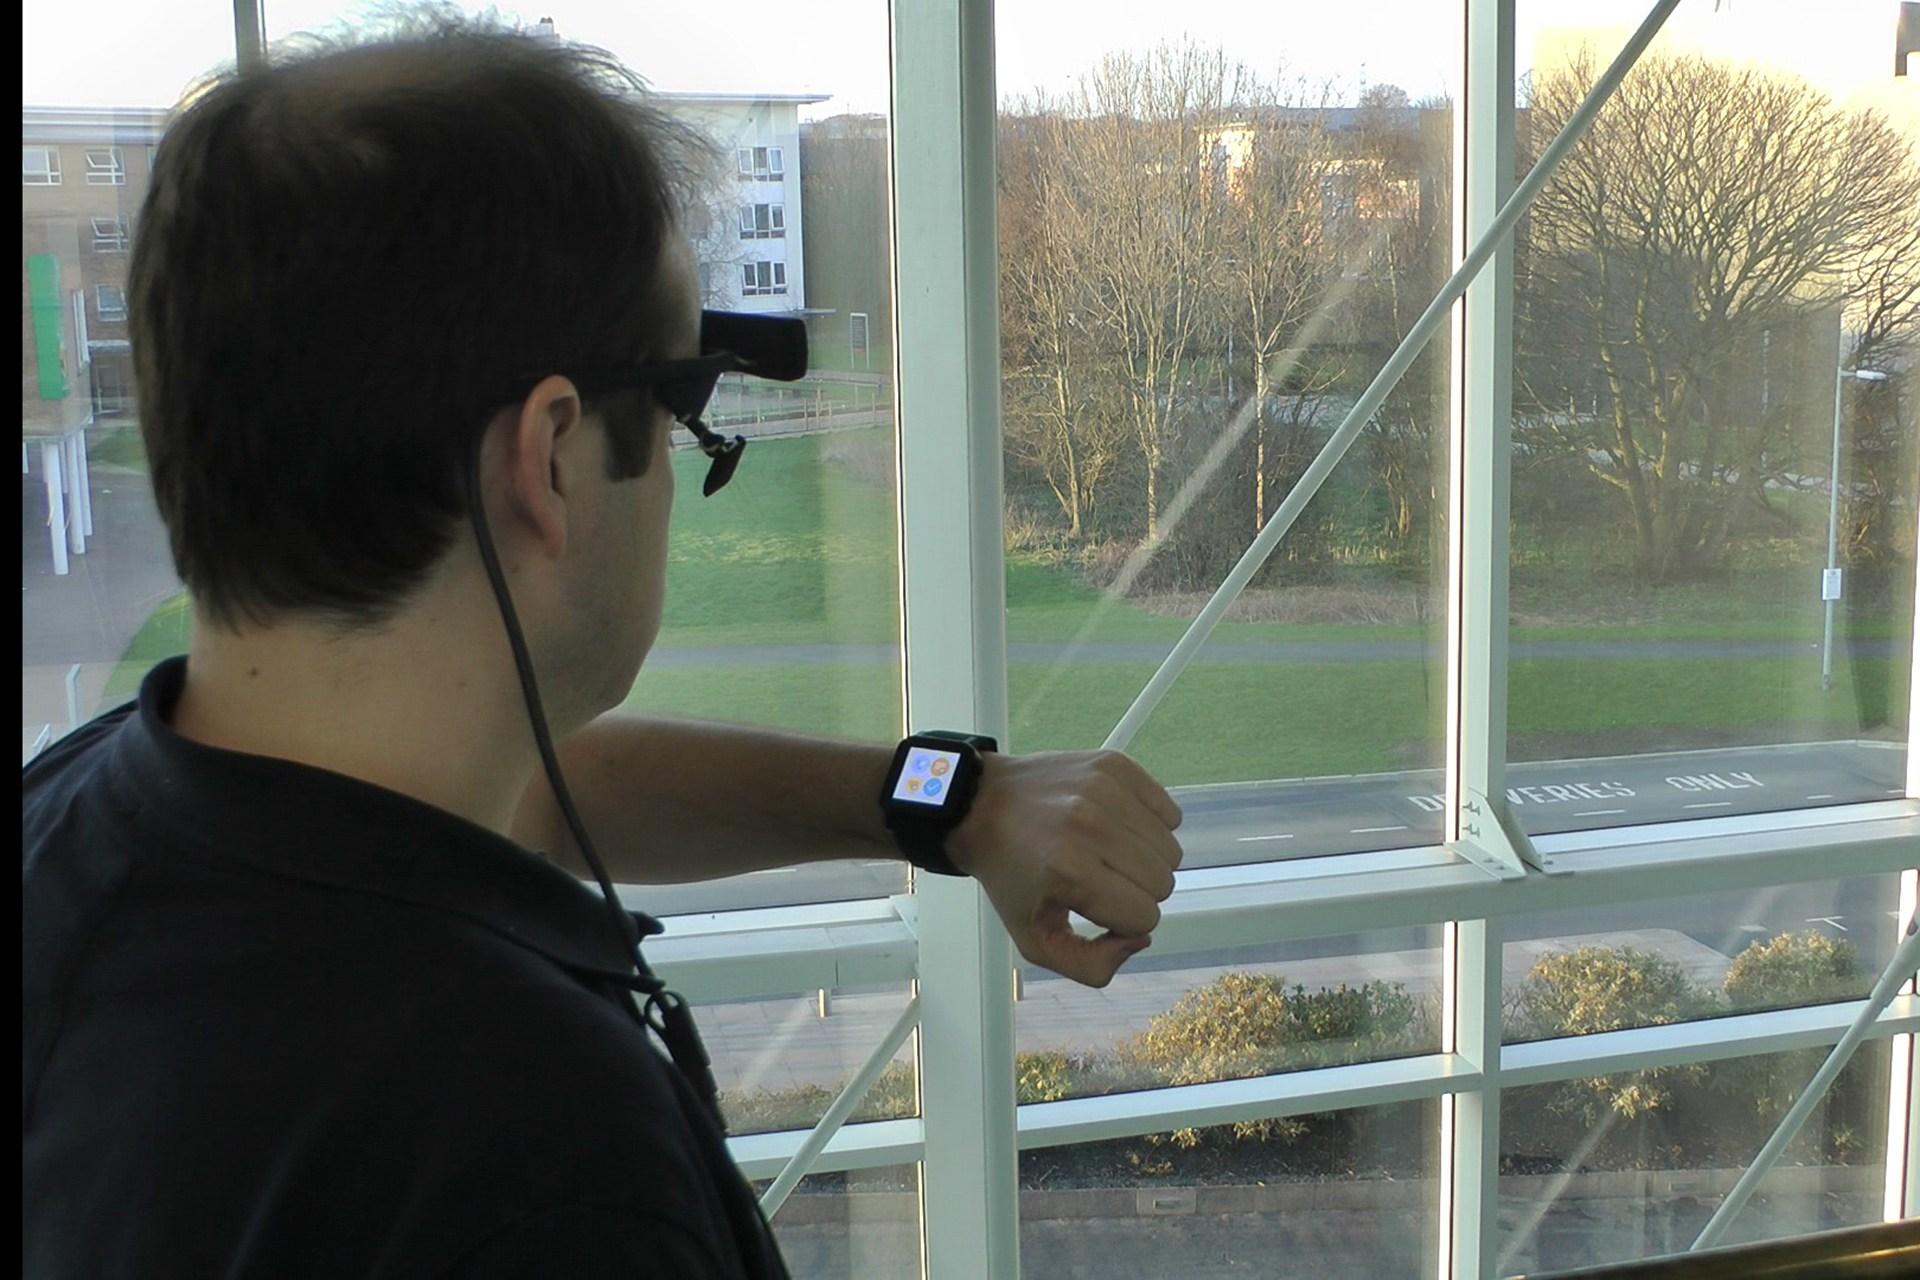 Smartwatch Control, Via Eye-Tracking